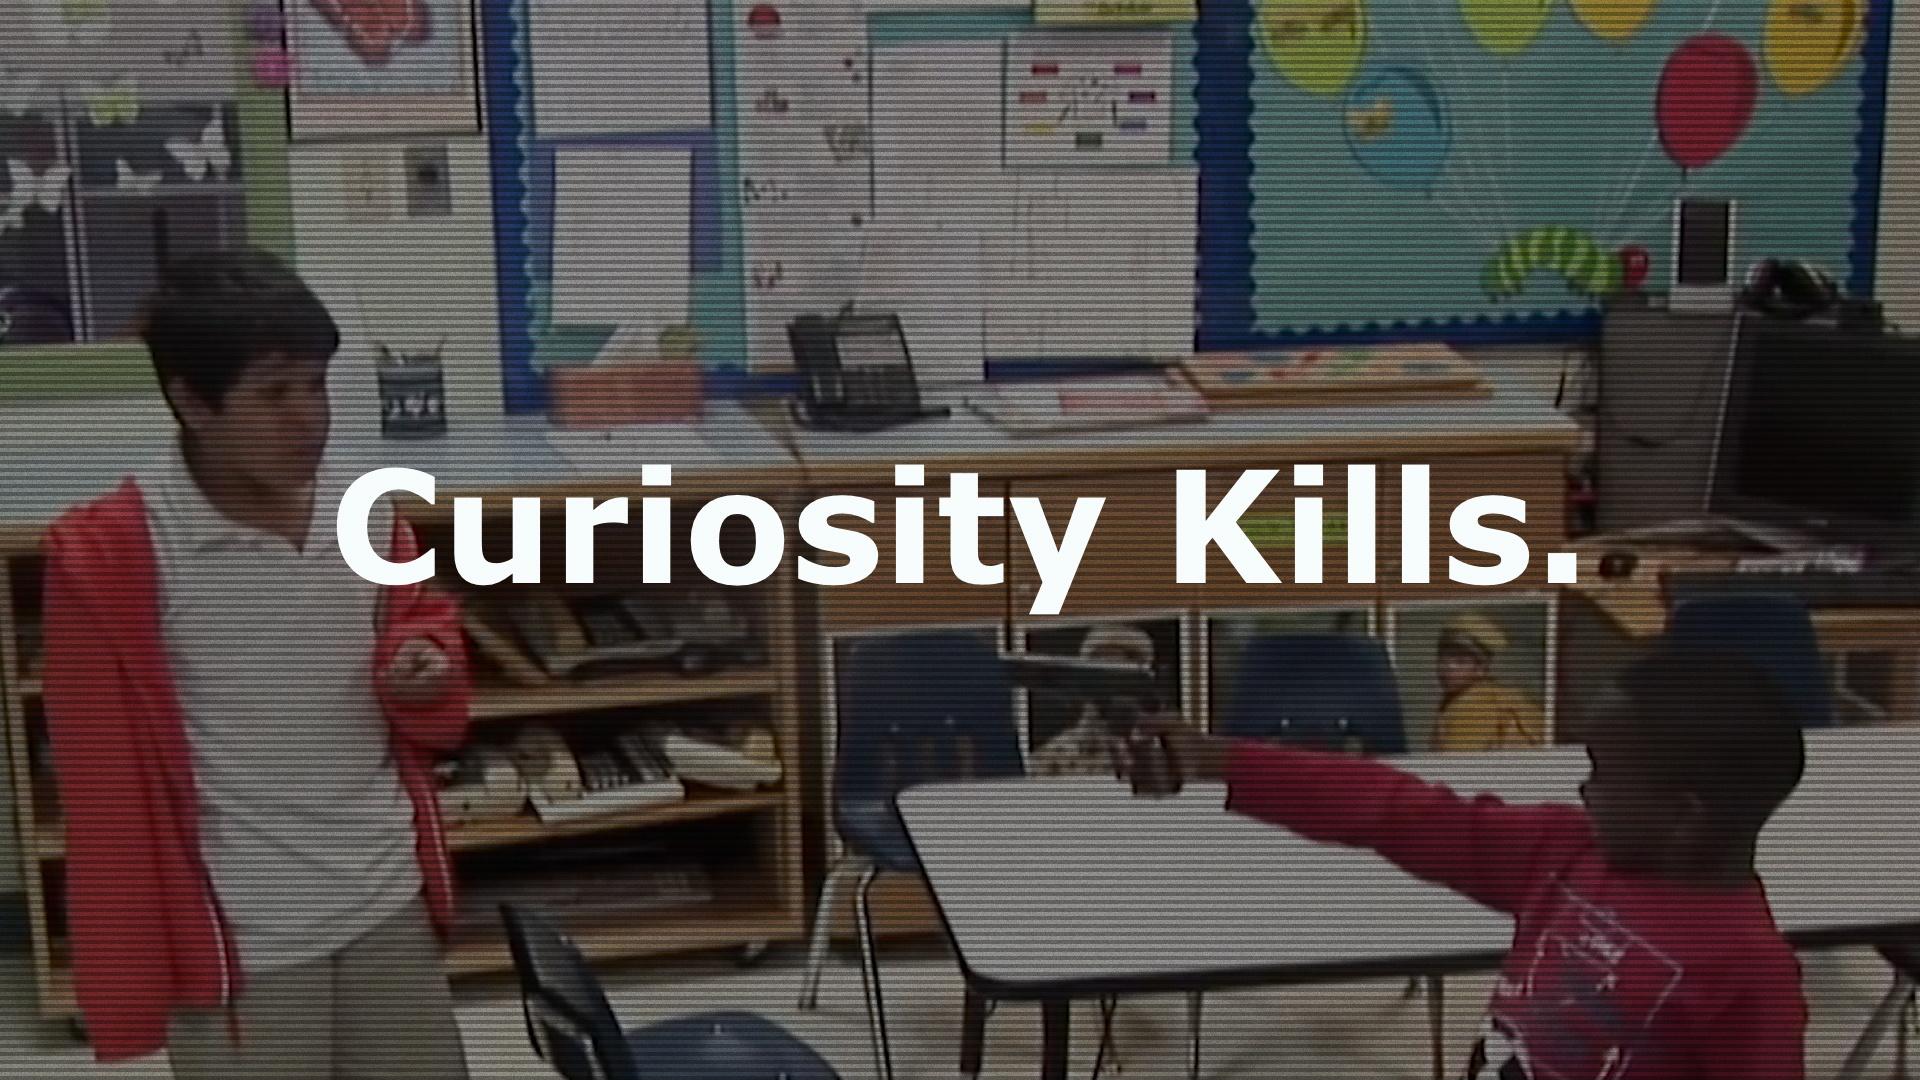 Thumbnail for Curiosity Kills